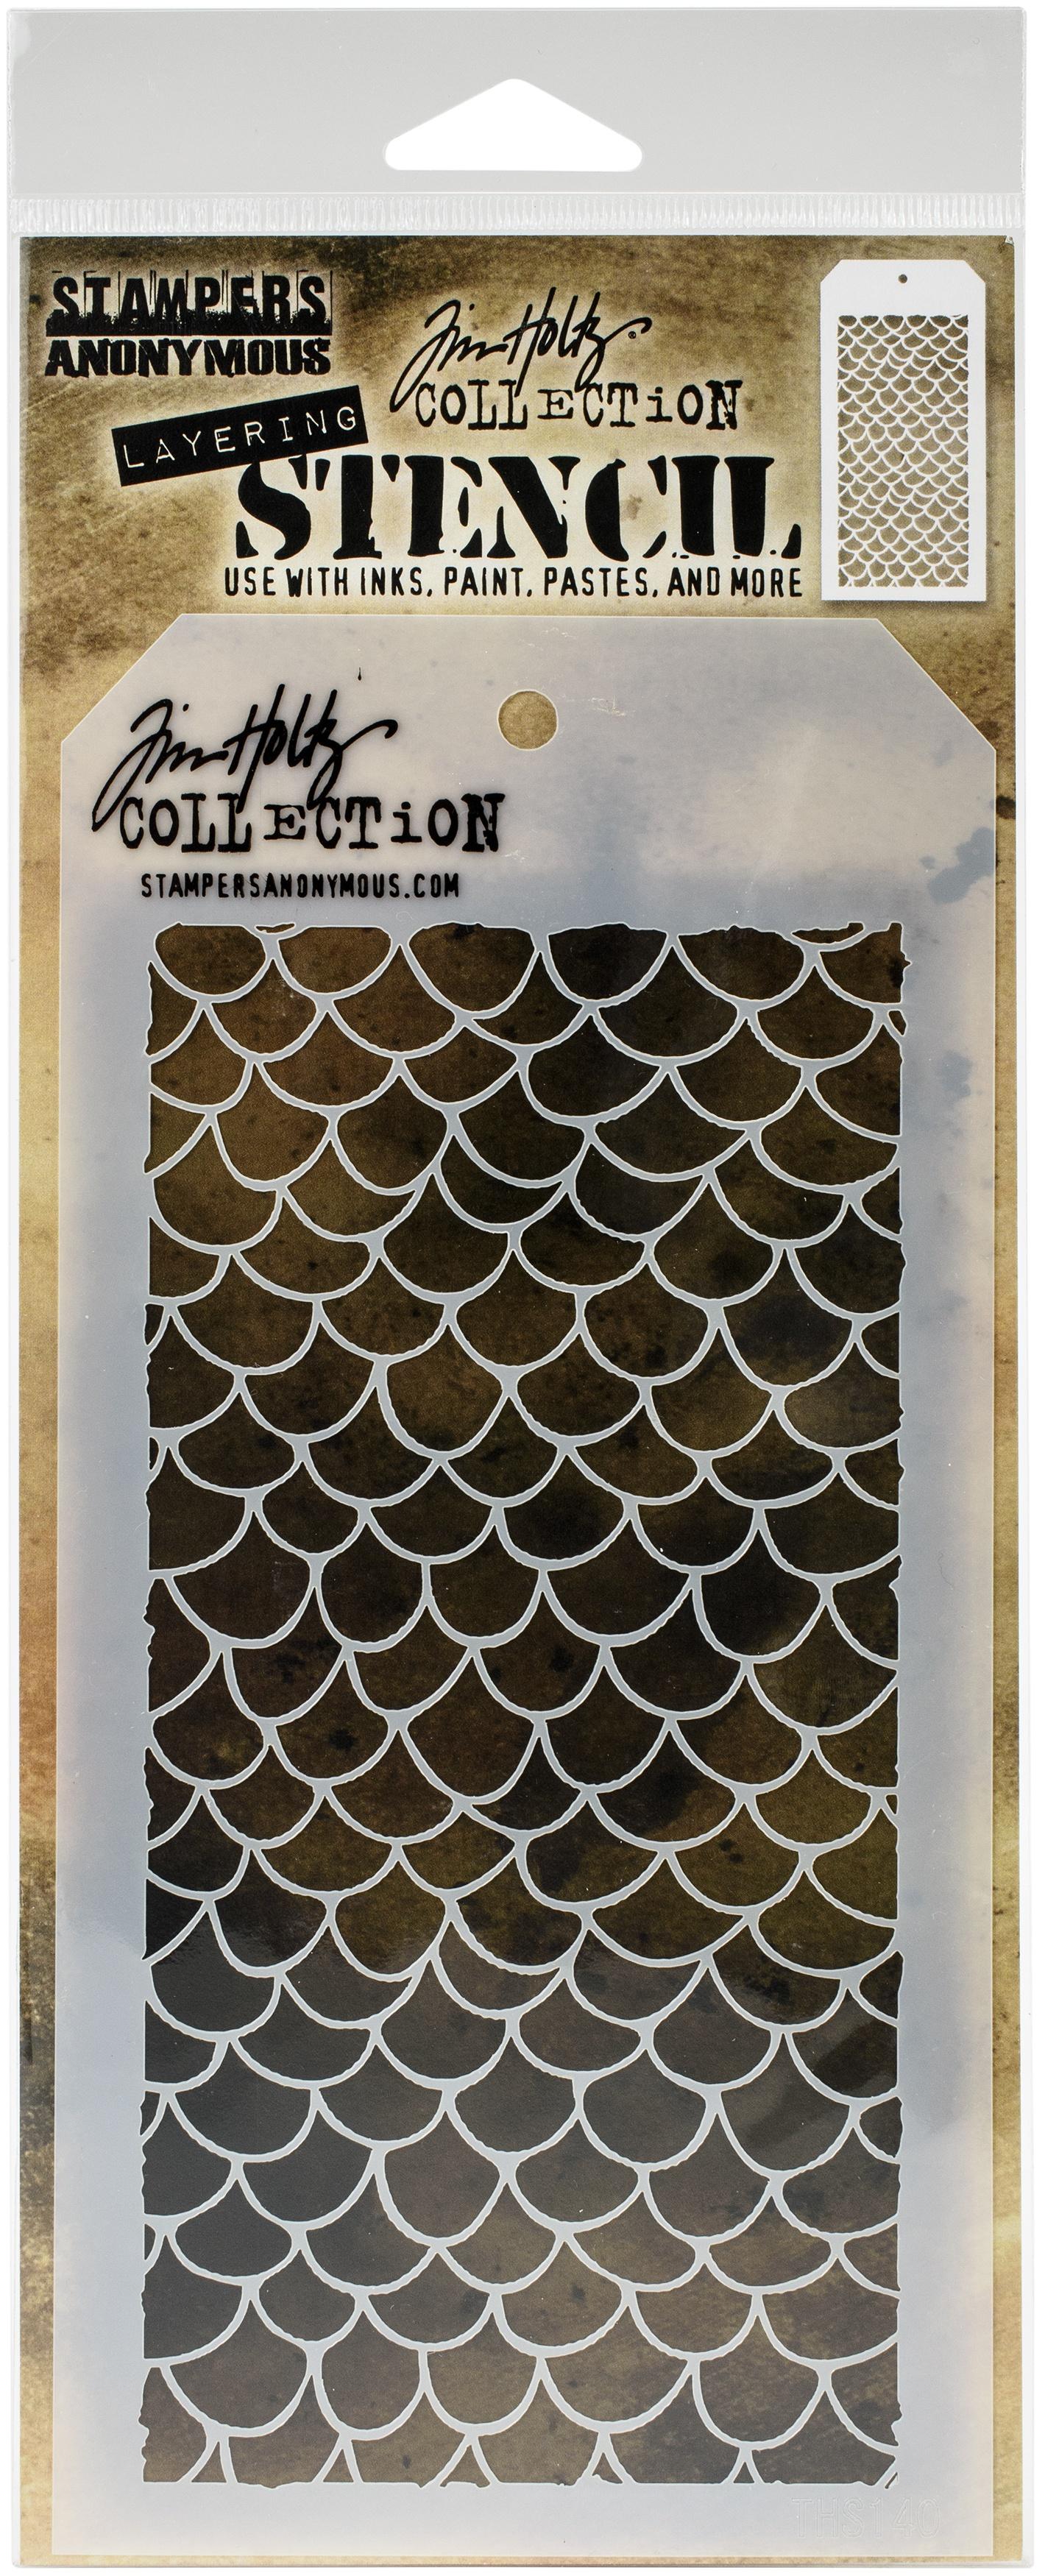 Tim Holtz Layered Stencil 4.125X8.5-Scales -Layered